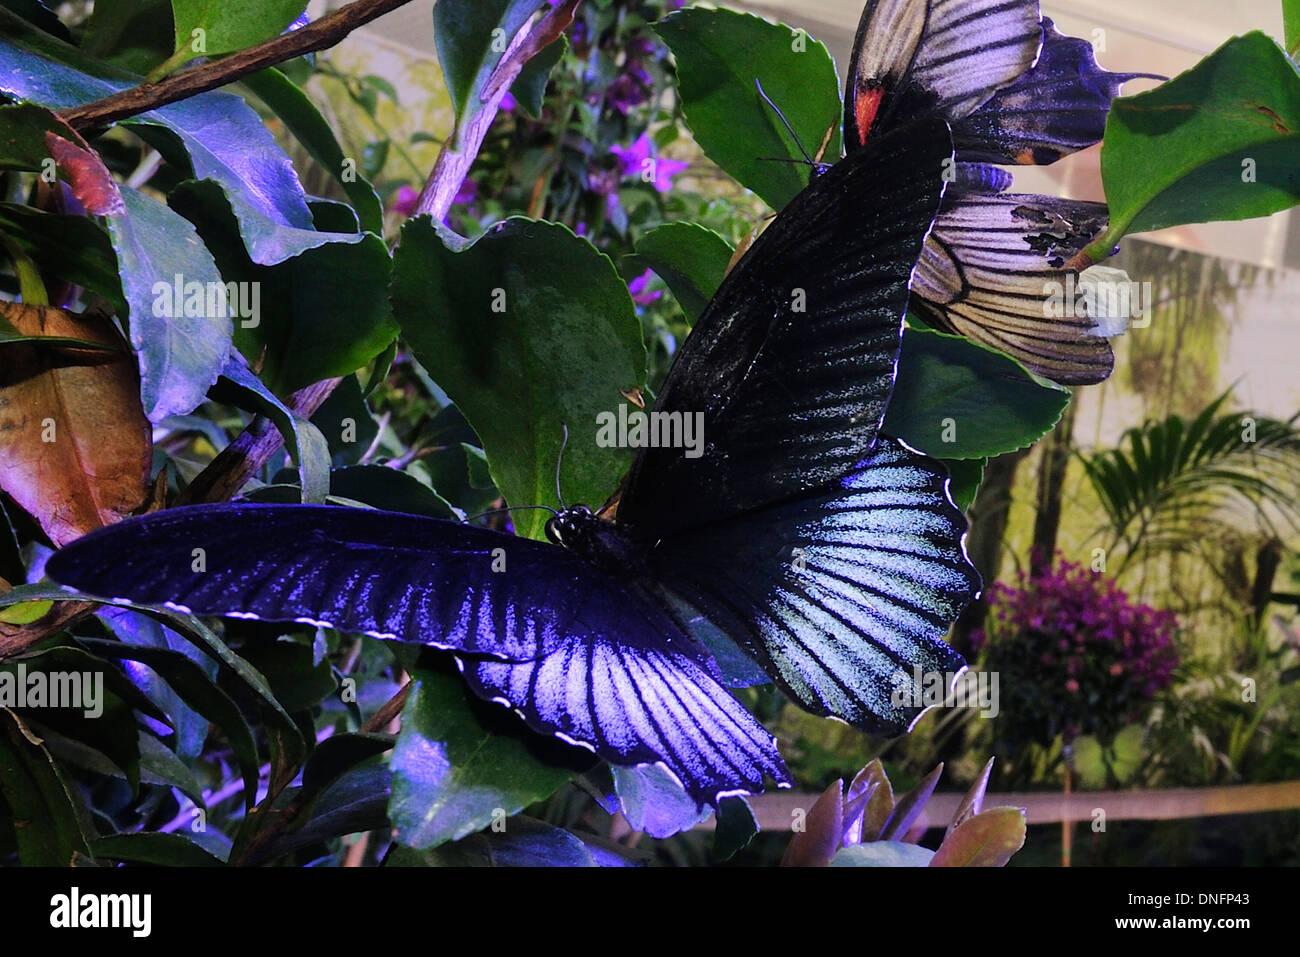 Blue Diadem Hypolimnas salmacis, Nymphalidae, Afrotropic ecozone (Africa) - Stock Image